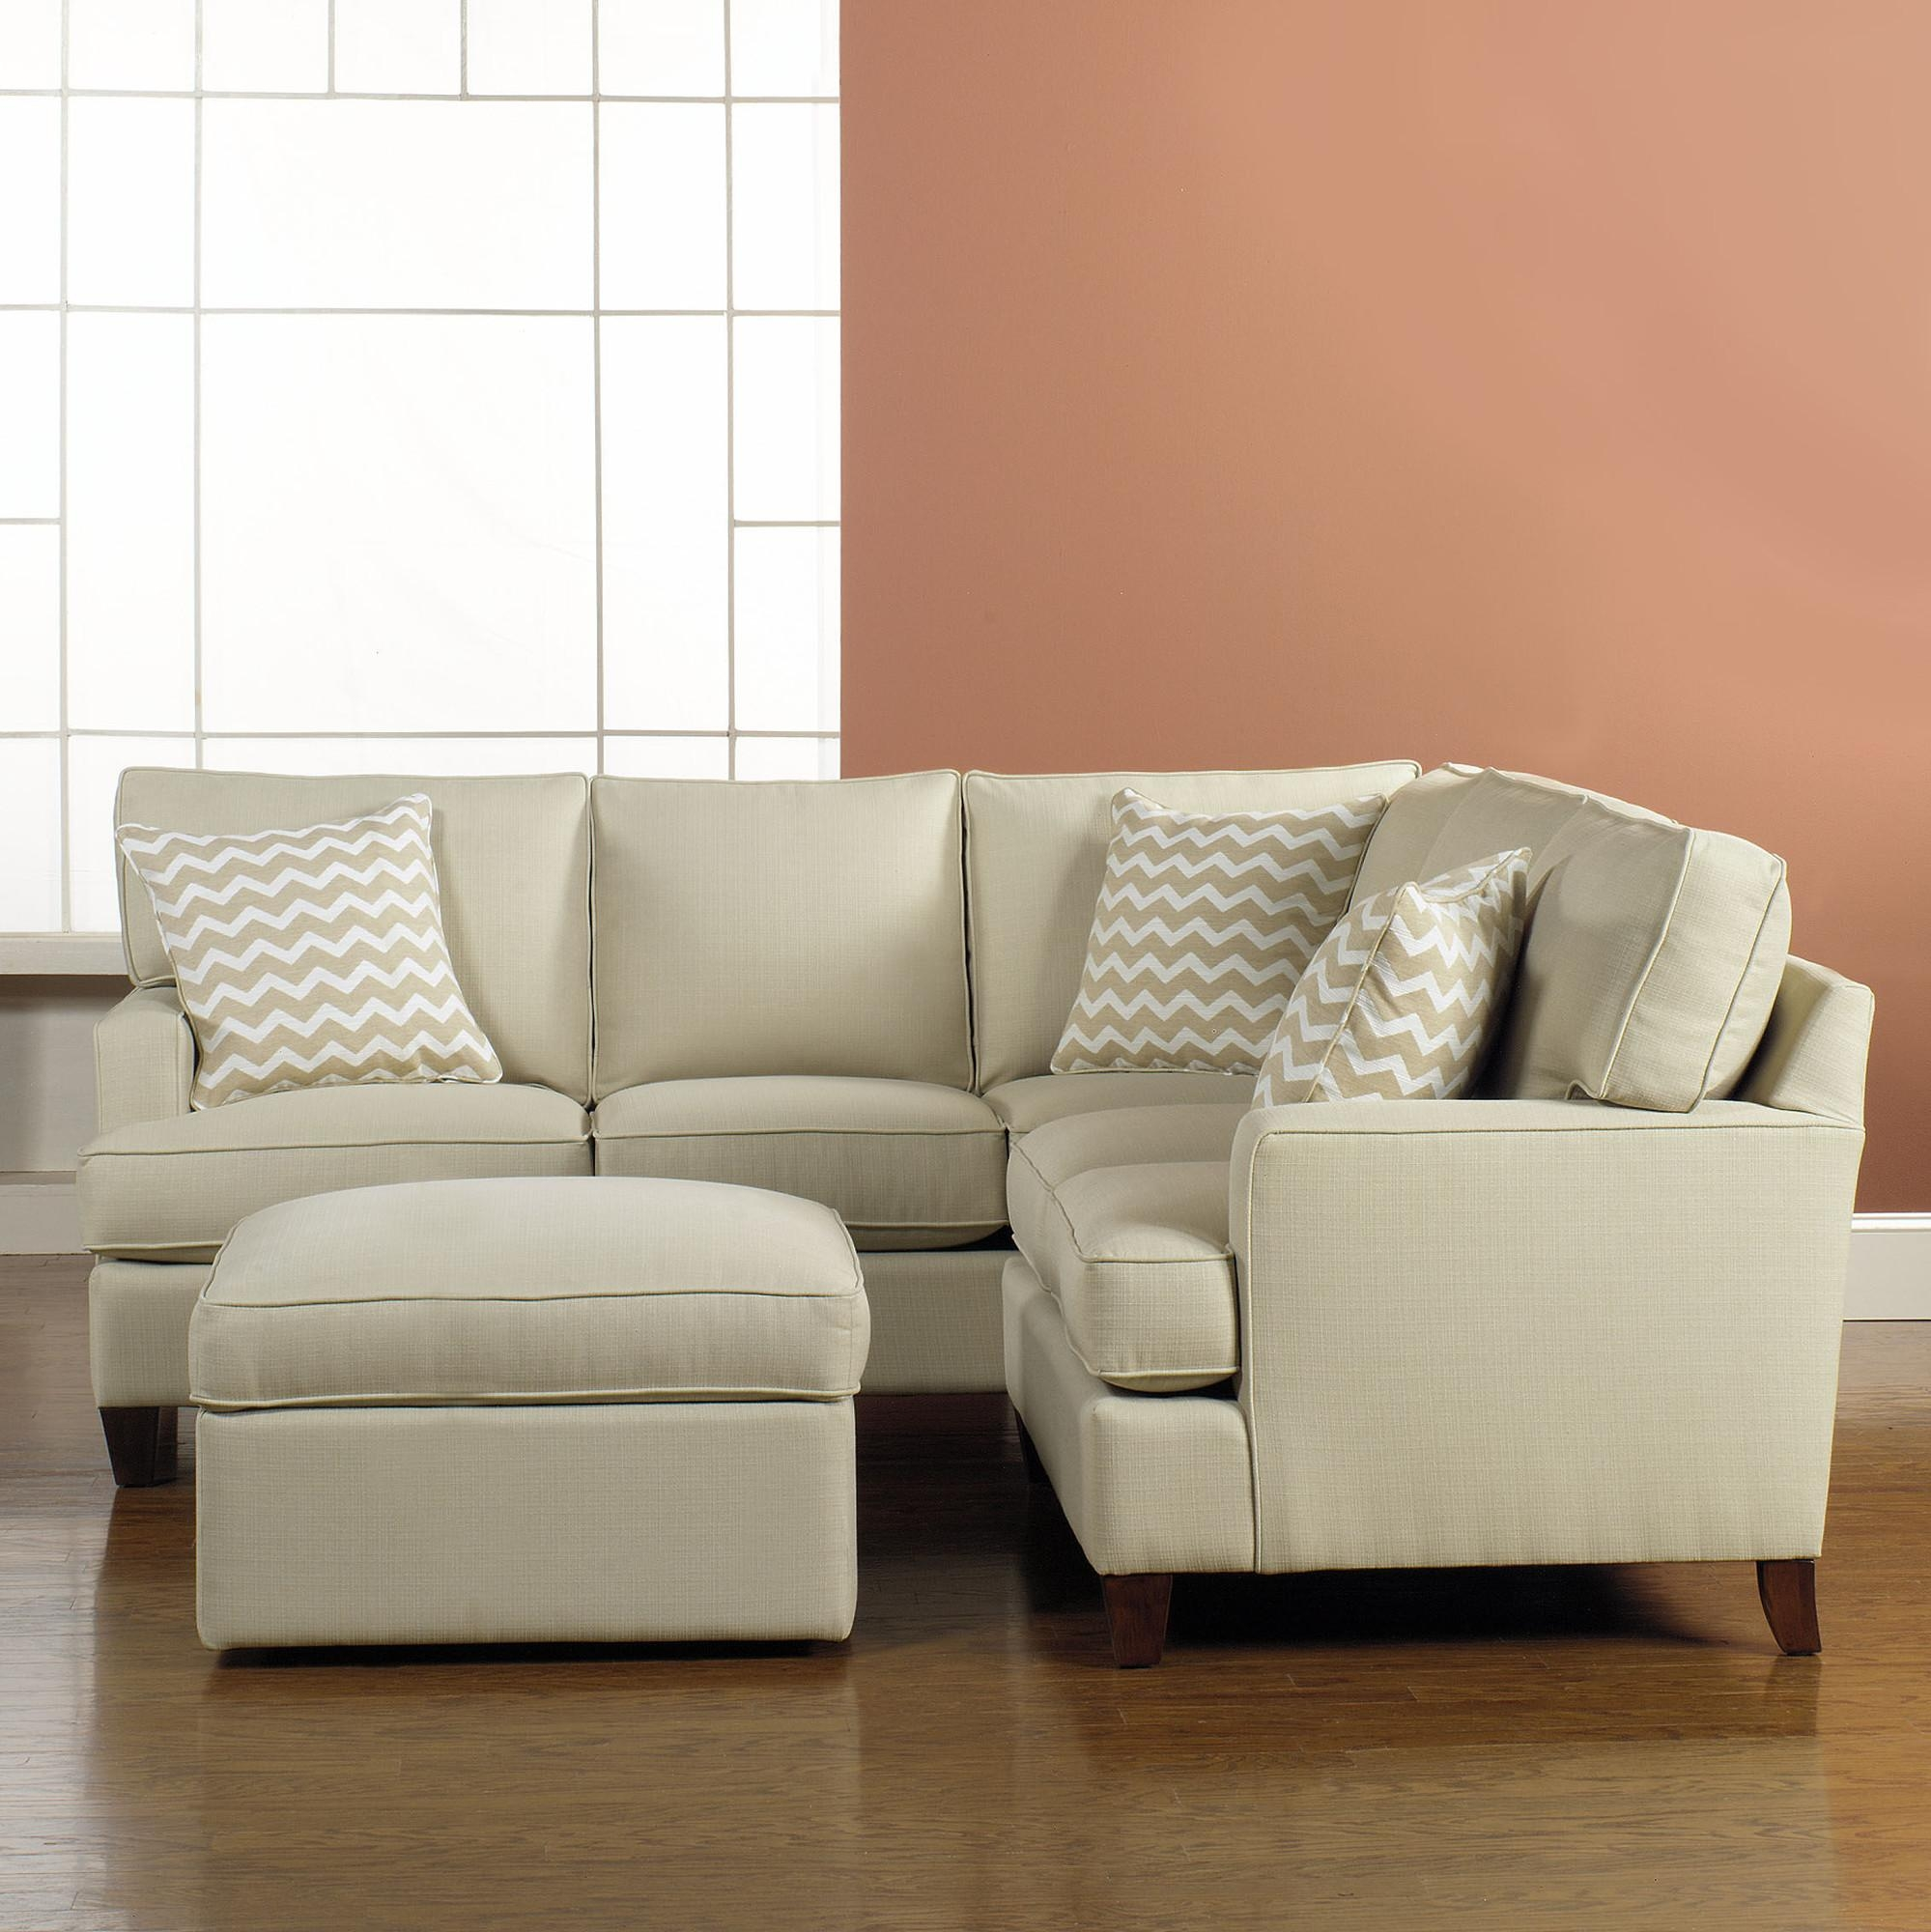 Small Space Sofas Top 10 Contemporary Sofas For Small Spaces For Sectional Small Spaces (View 3 of 20)